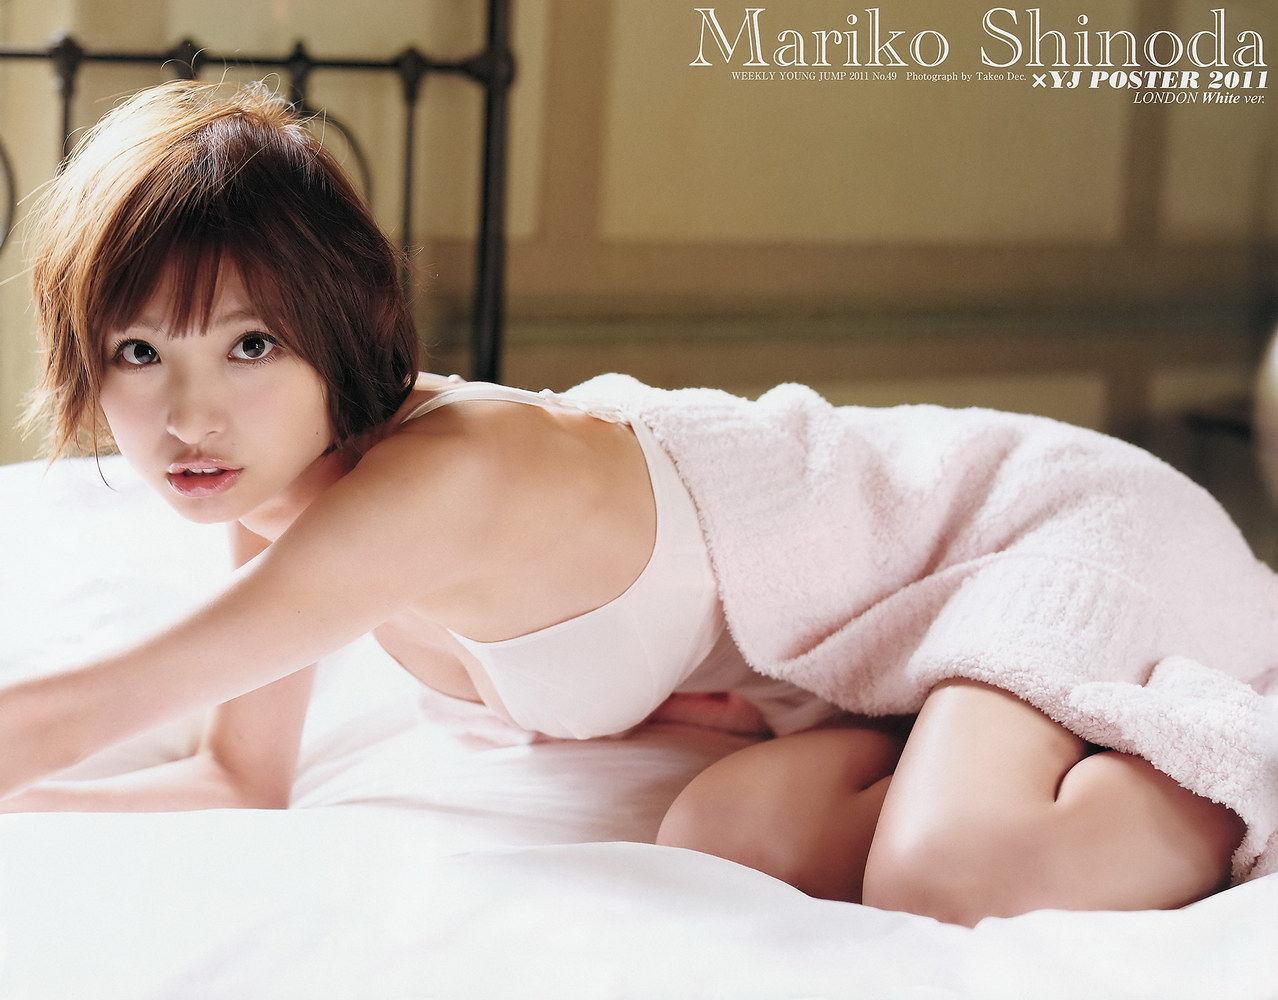 http://blog.cnobi.jp/v1/blog/user/a8c5c06266ed65ea9b67299e90592fa7/1345855156